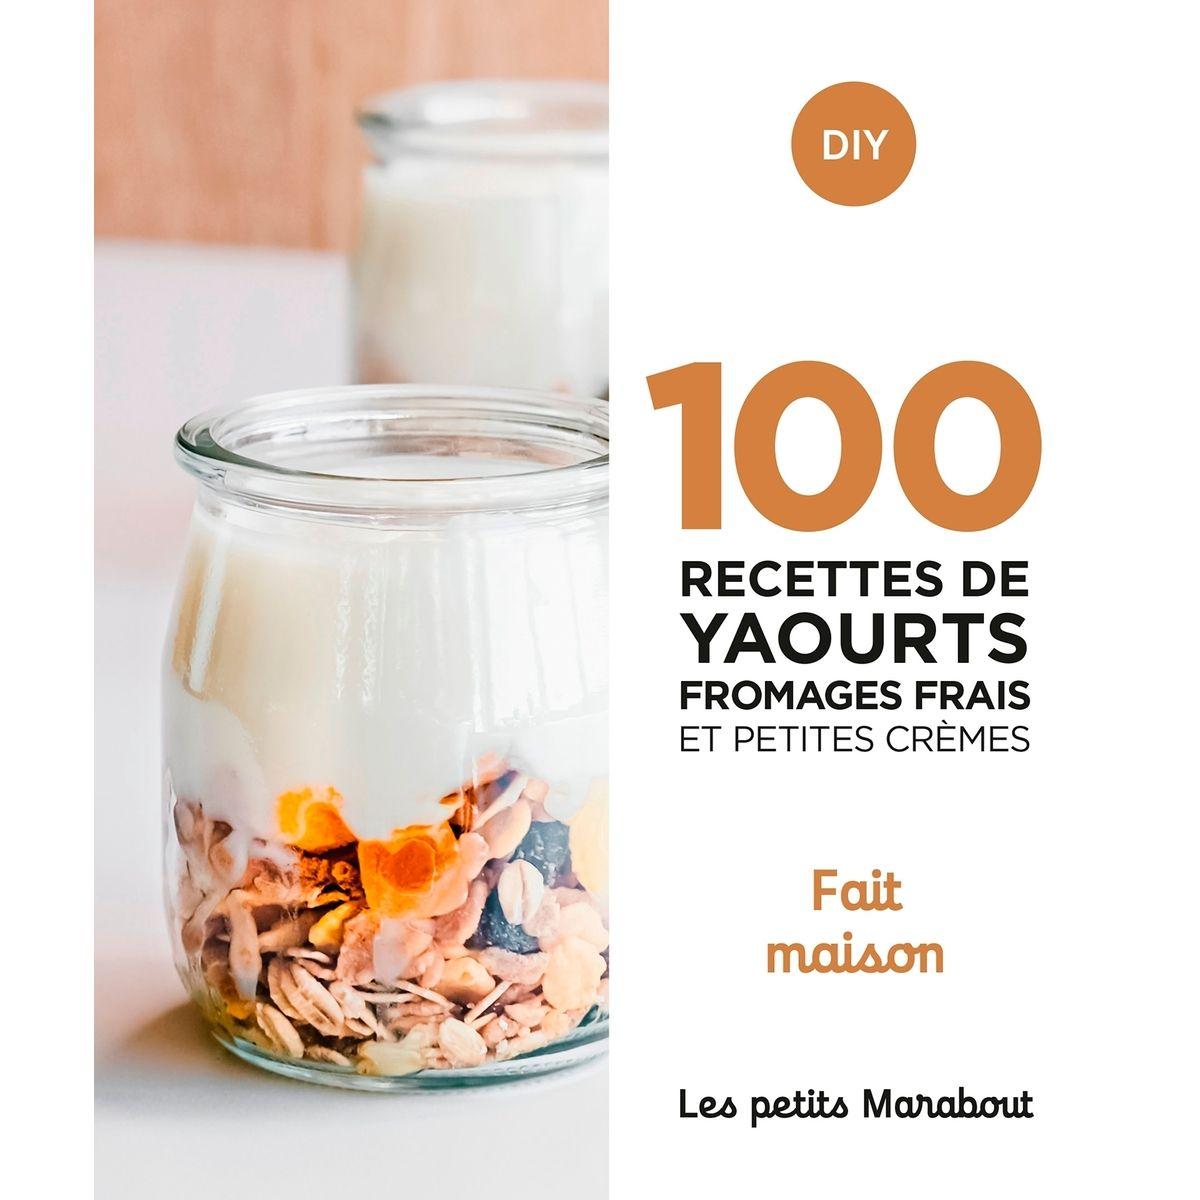 100 recettes : Yaourts fromages frais et cremes - Marabout